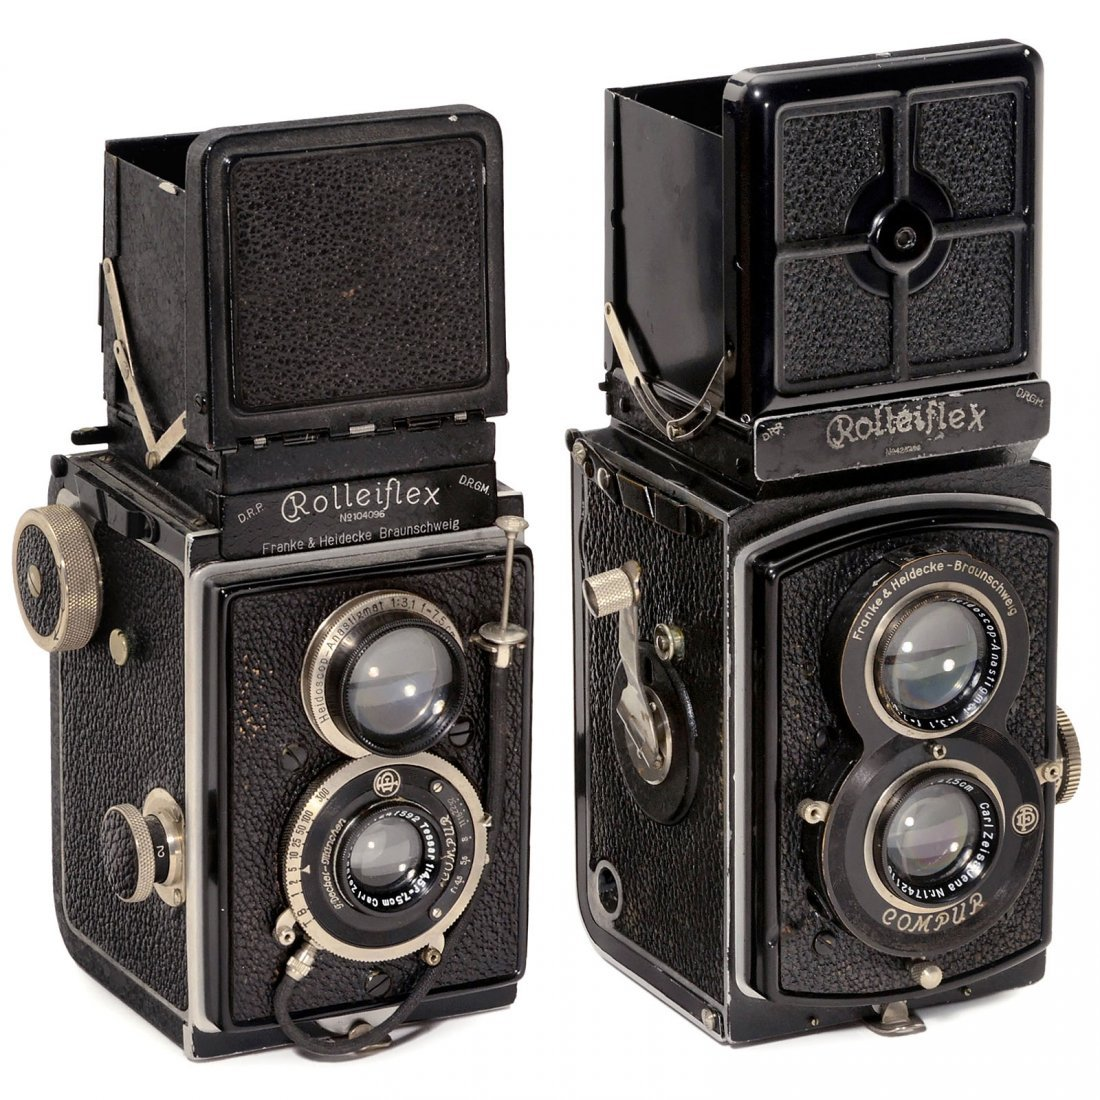 Rolleiflex 6 x 6 (1929) and Rolleiflex Standard 3,5